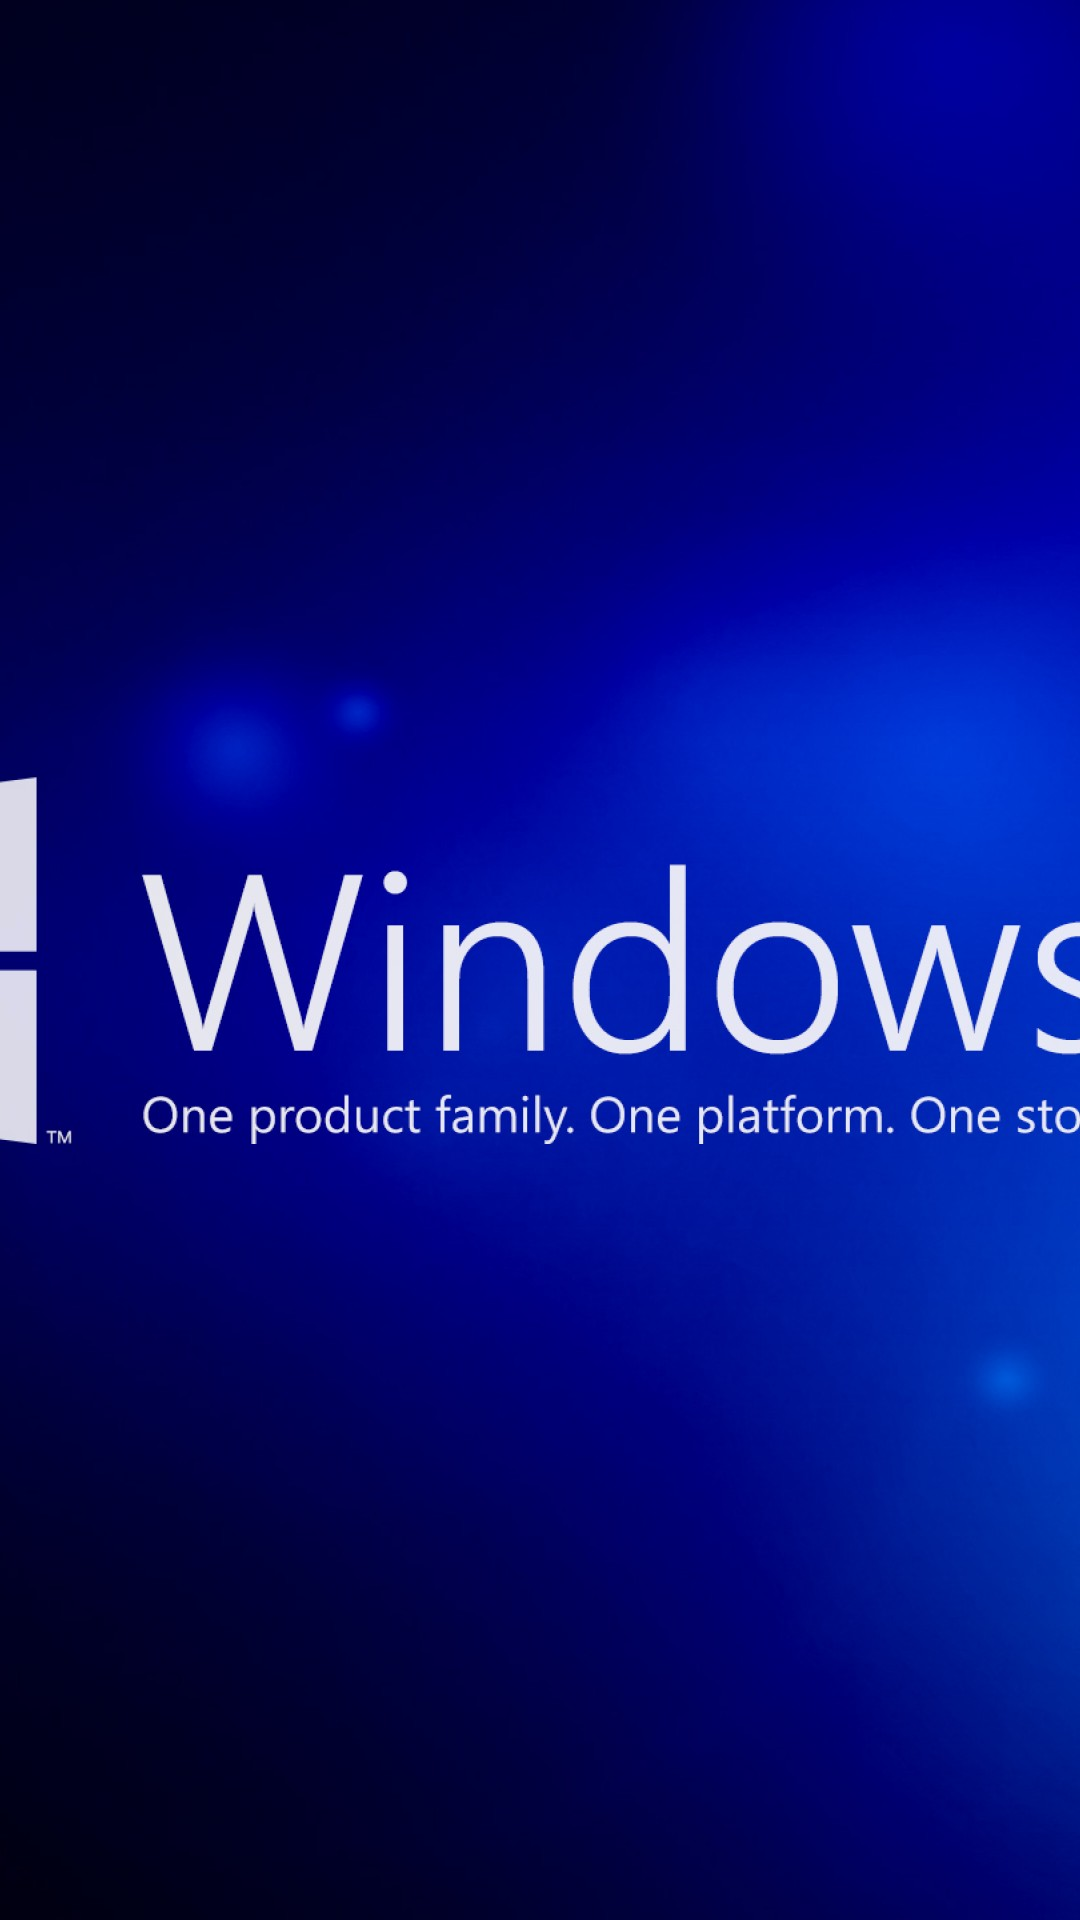 Free Download Dark Blue Windows 10 Wallpaper Iphone 6 Plus